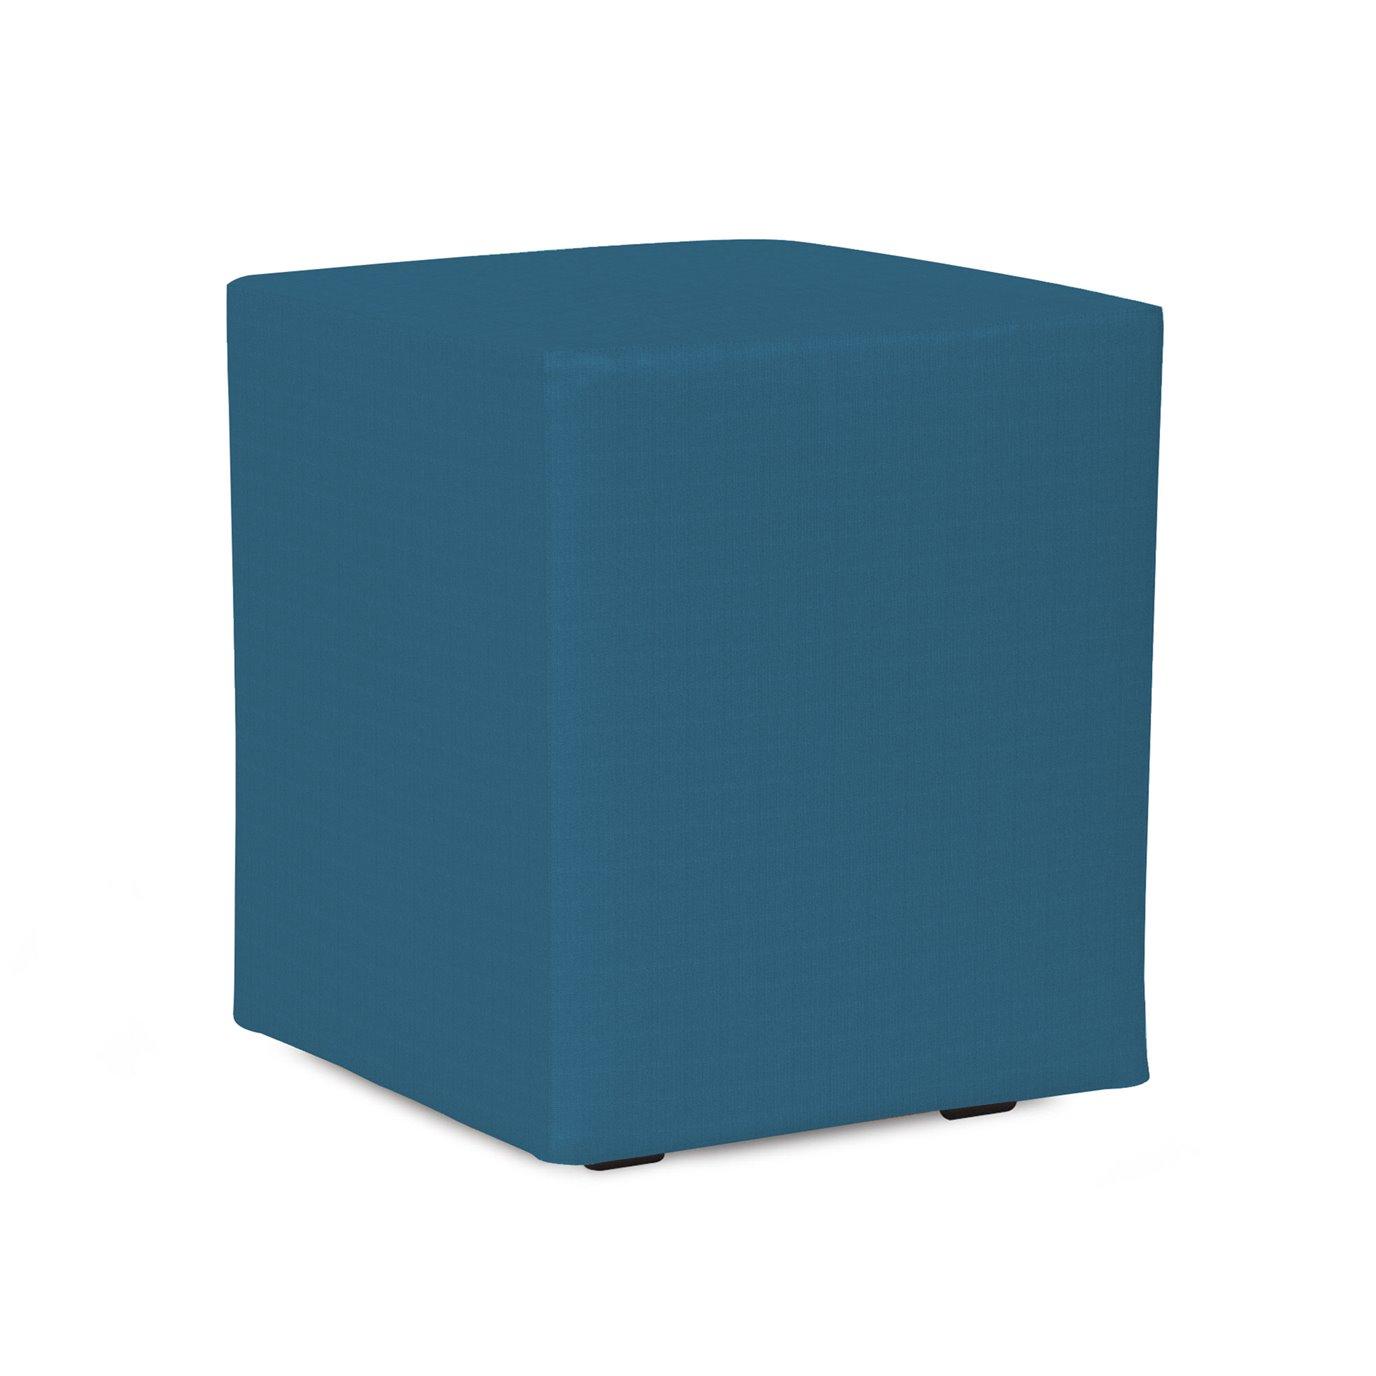 Howard Elliott Universal Cube Outdoor Sunbrella Seascape Turquoise Complete Ottoman